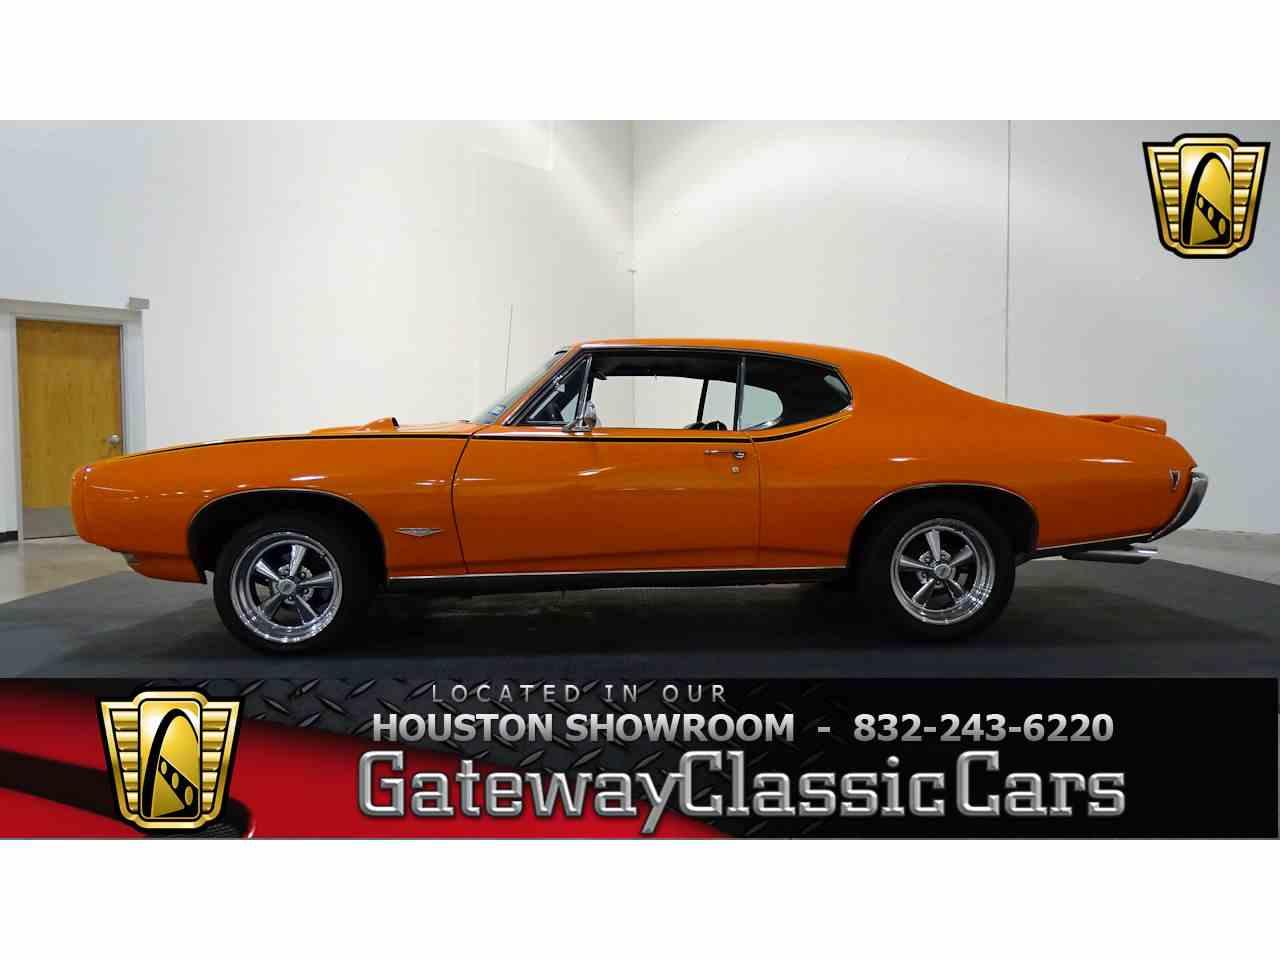 Classic Cars For Sale Houston Area: 1968 Pontiac GTO For Sale